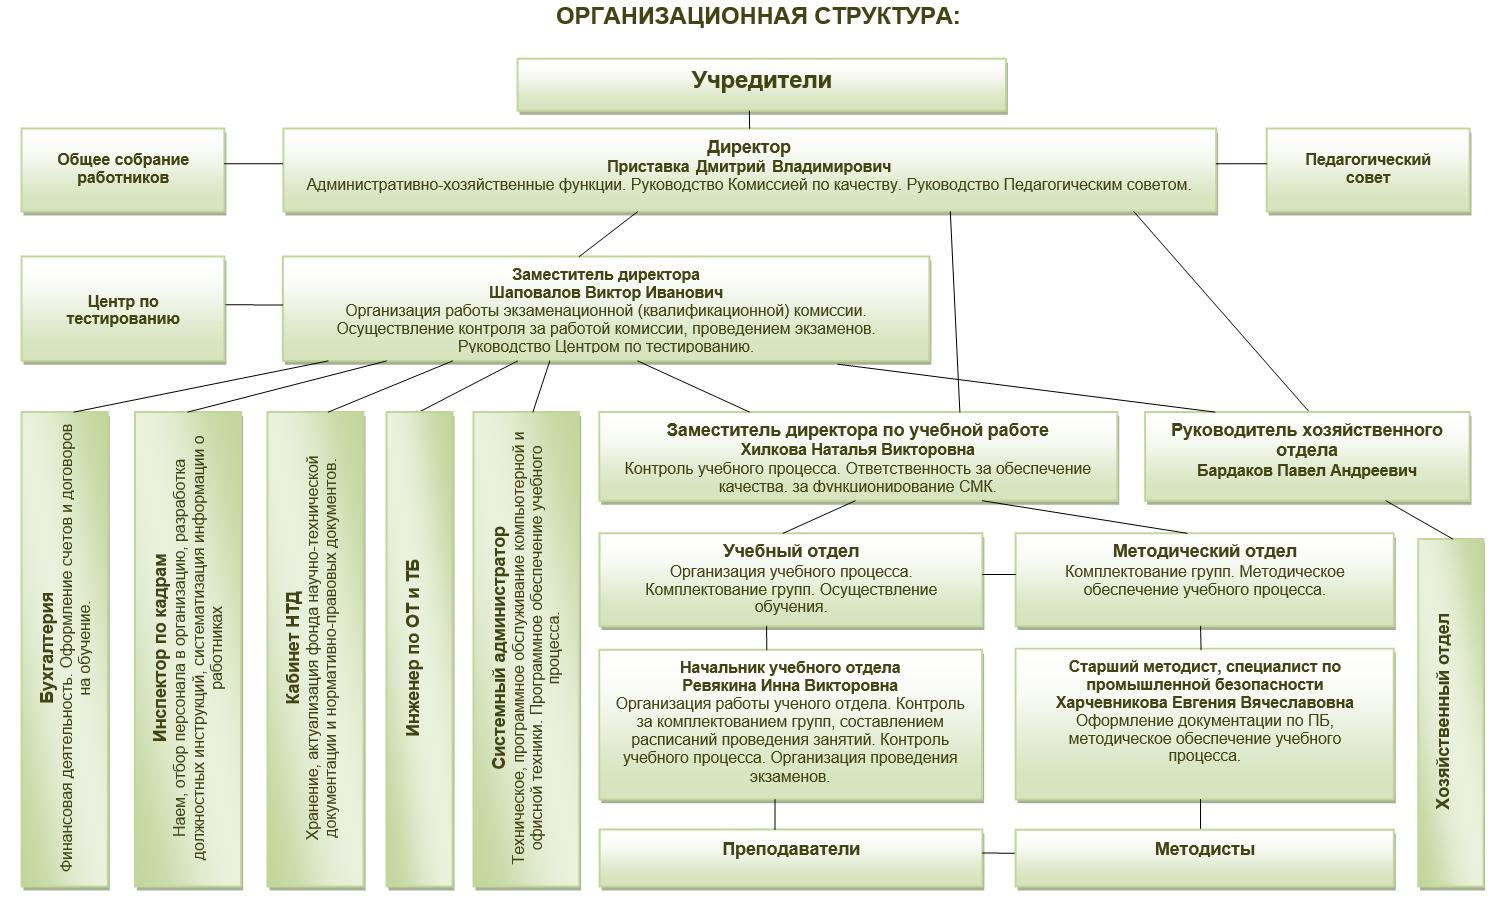 Взаимодействие отделов на предприятии схема